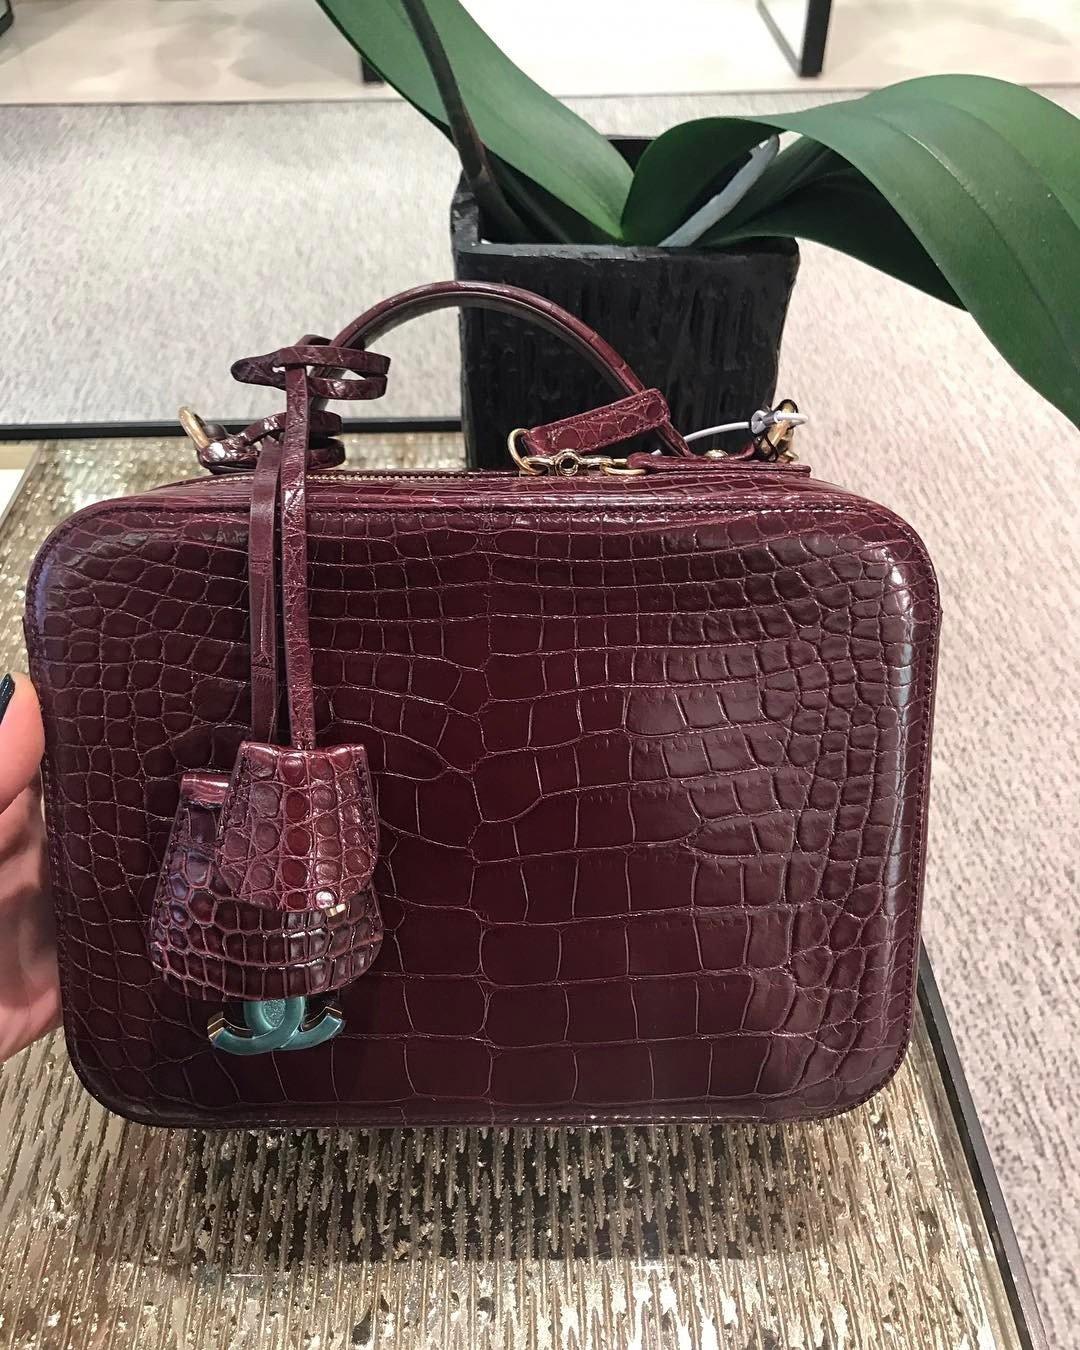 Chanel-Croc-CC-Filigree-Bag